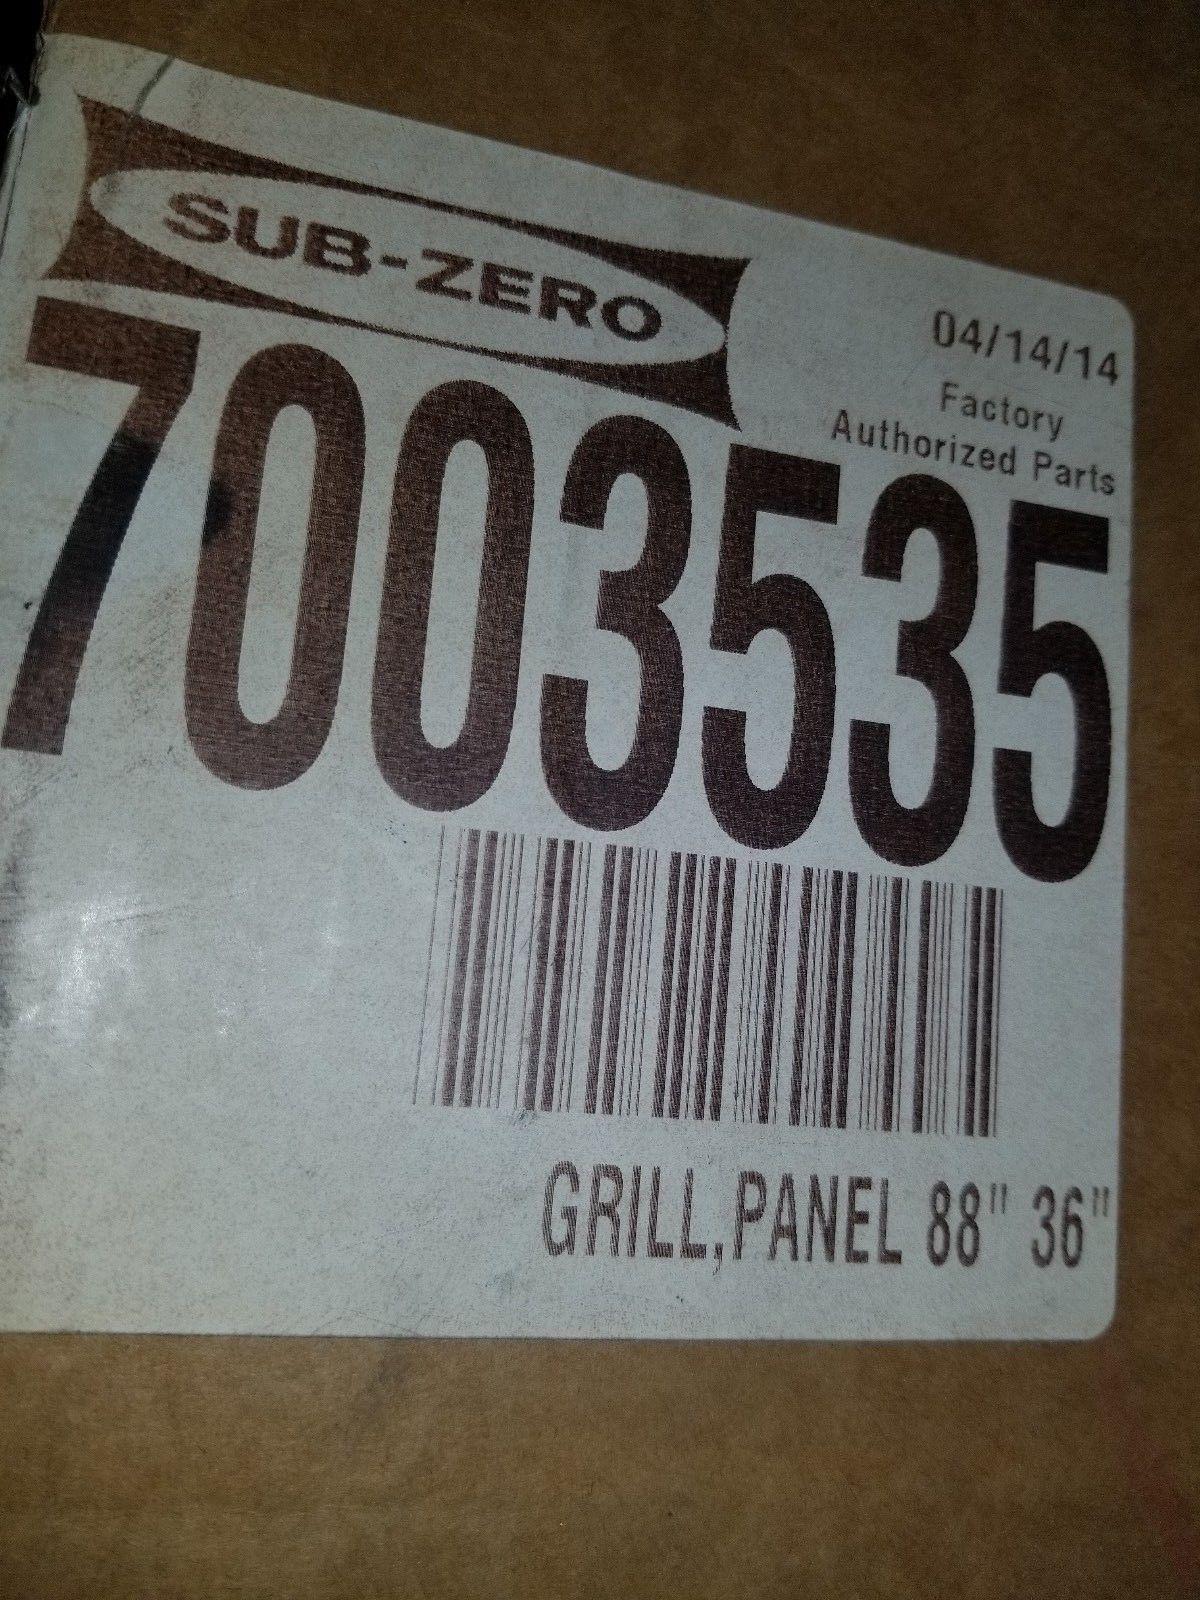 SUB-ZERO OVERLAY OR FLUSH INSET GRILL PANEL 7003535 - $202.95